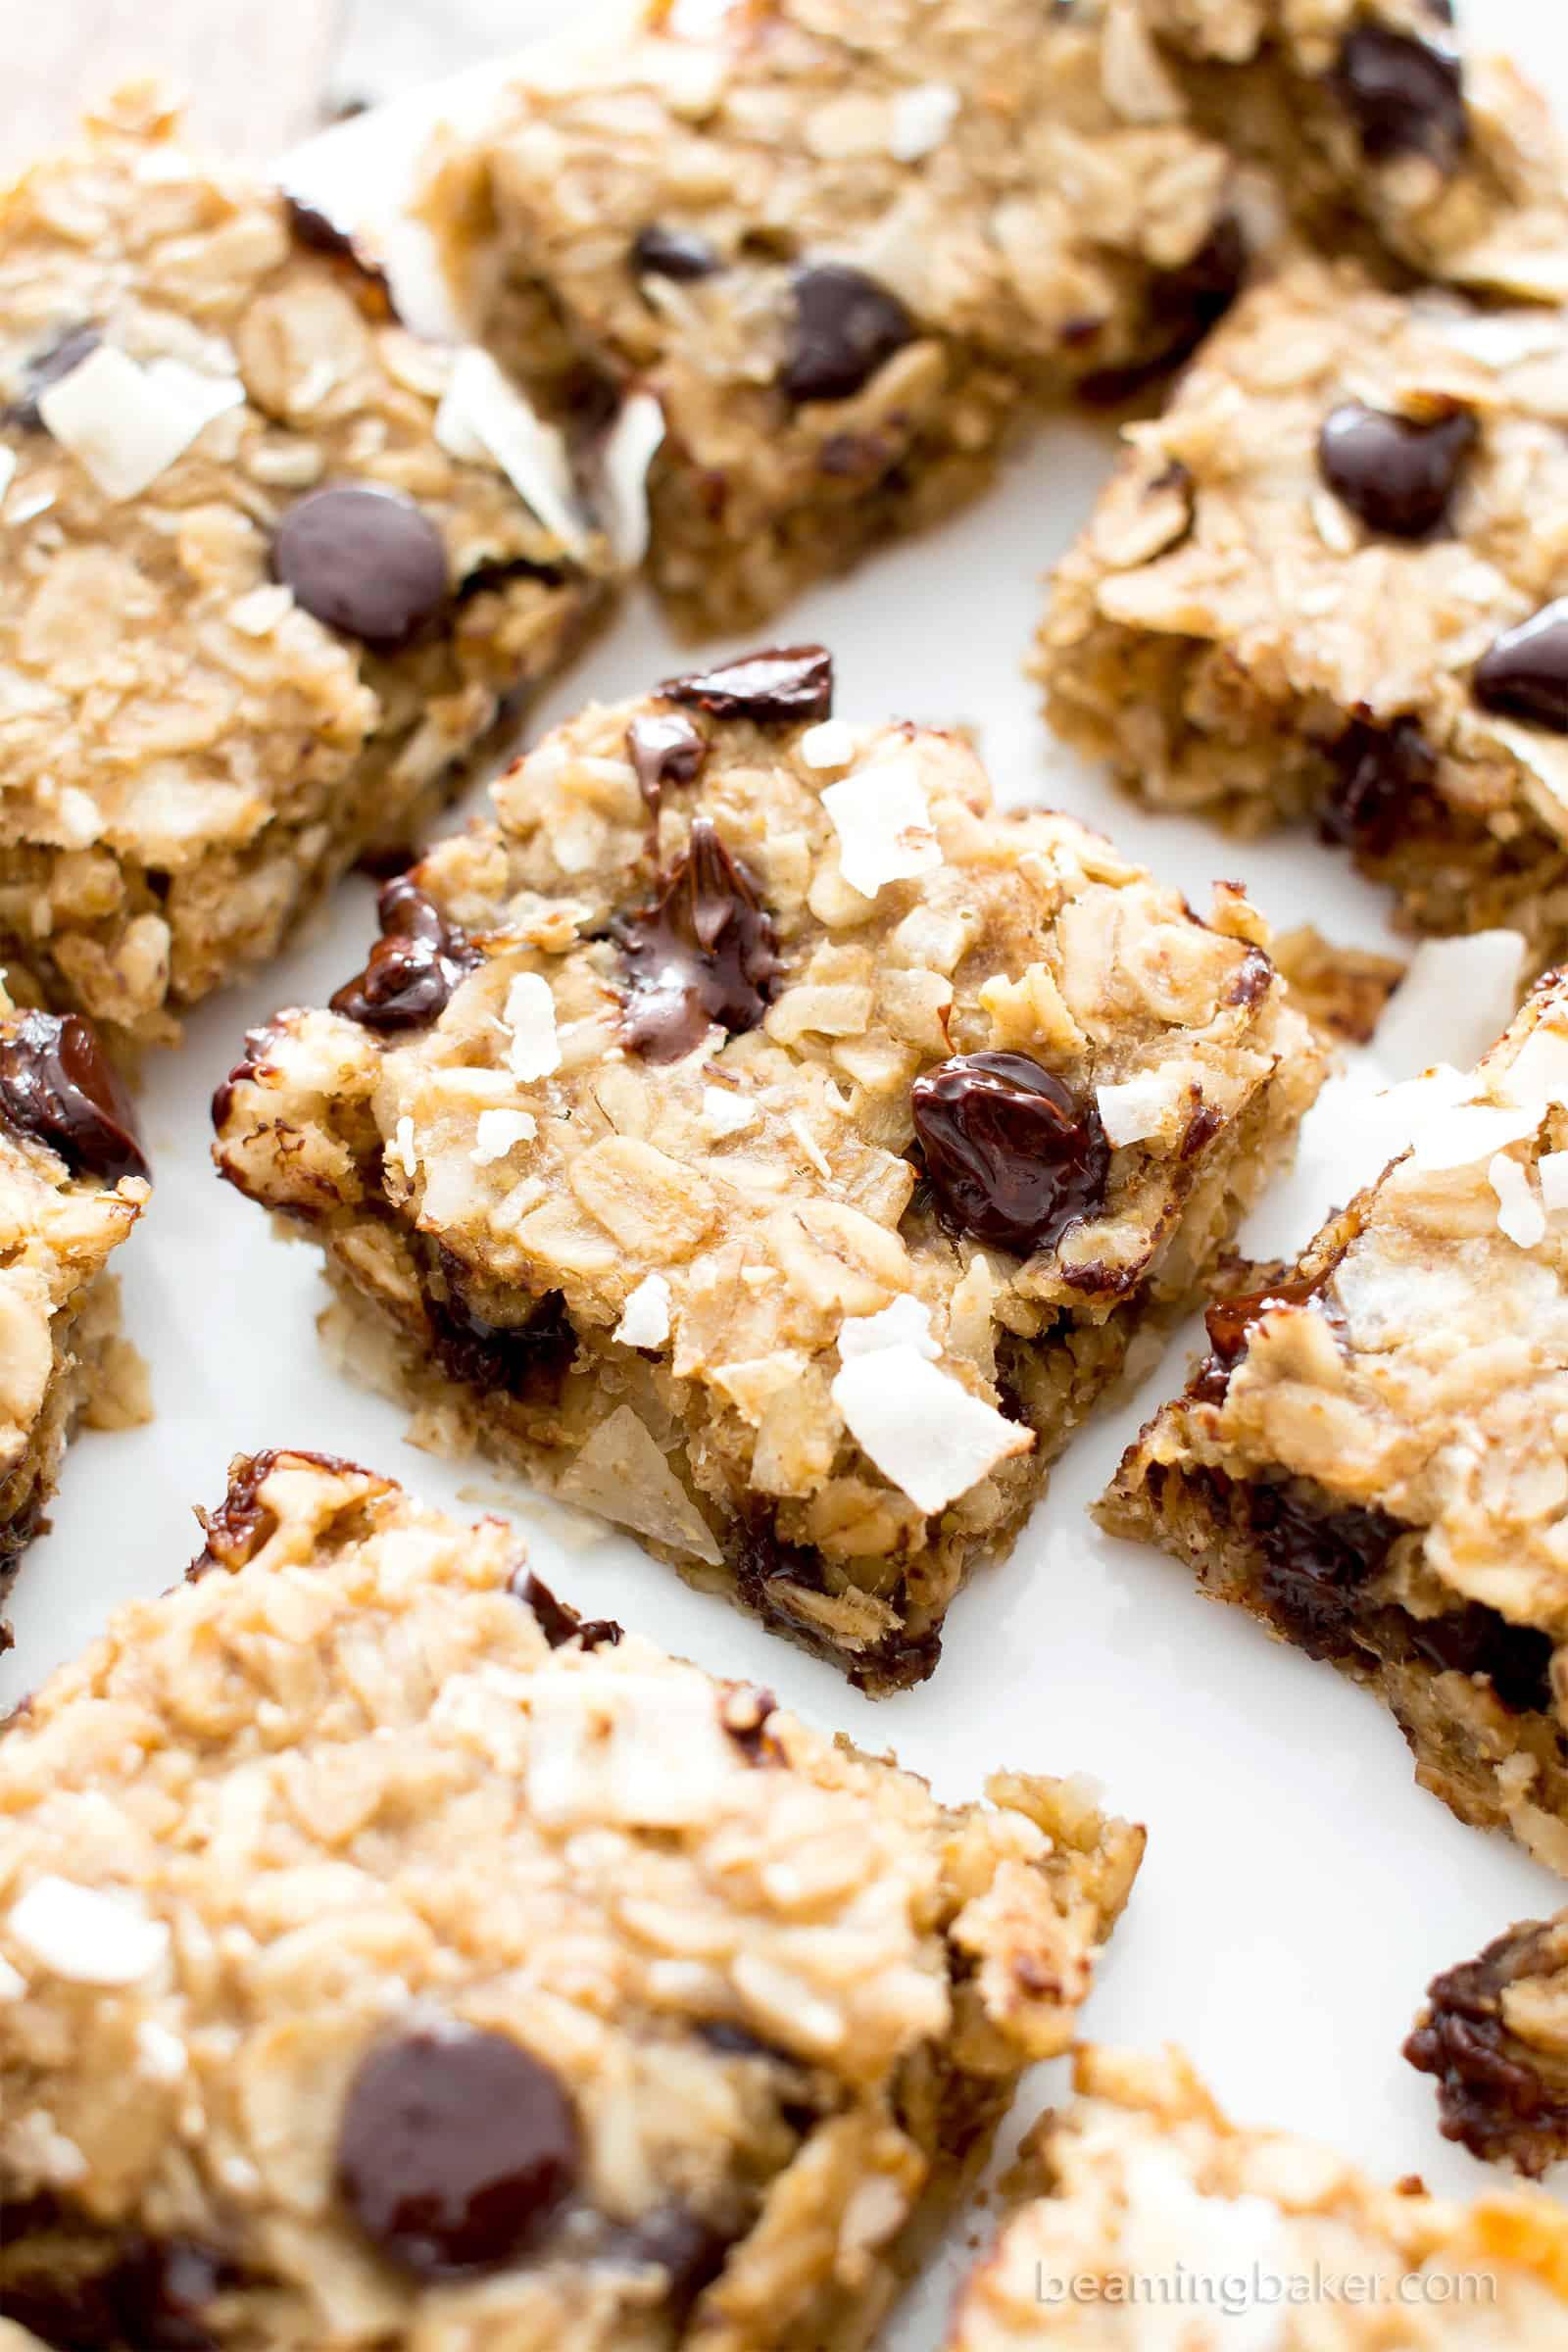 Healthy Homemade Breakfast Bars  Easy Gluten Free Coconut Chocolate Chip Banana Breakfast